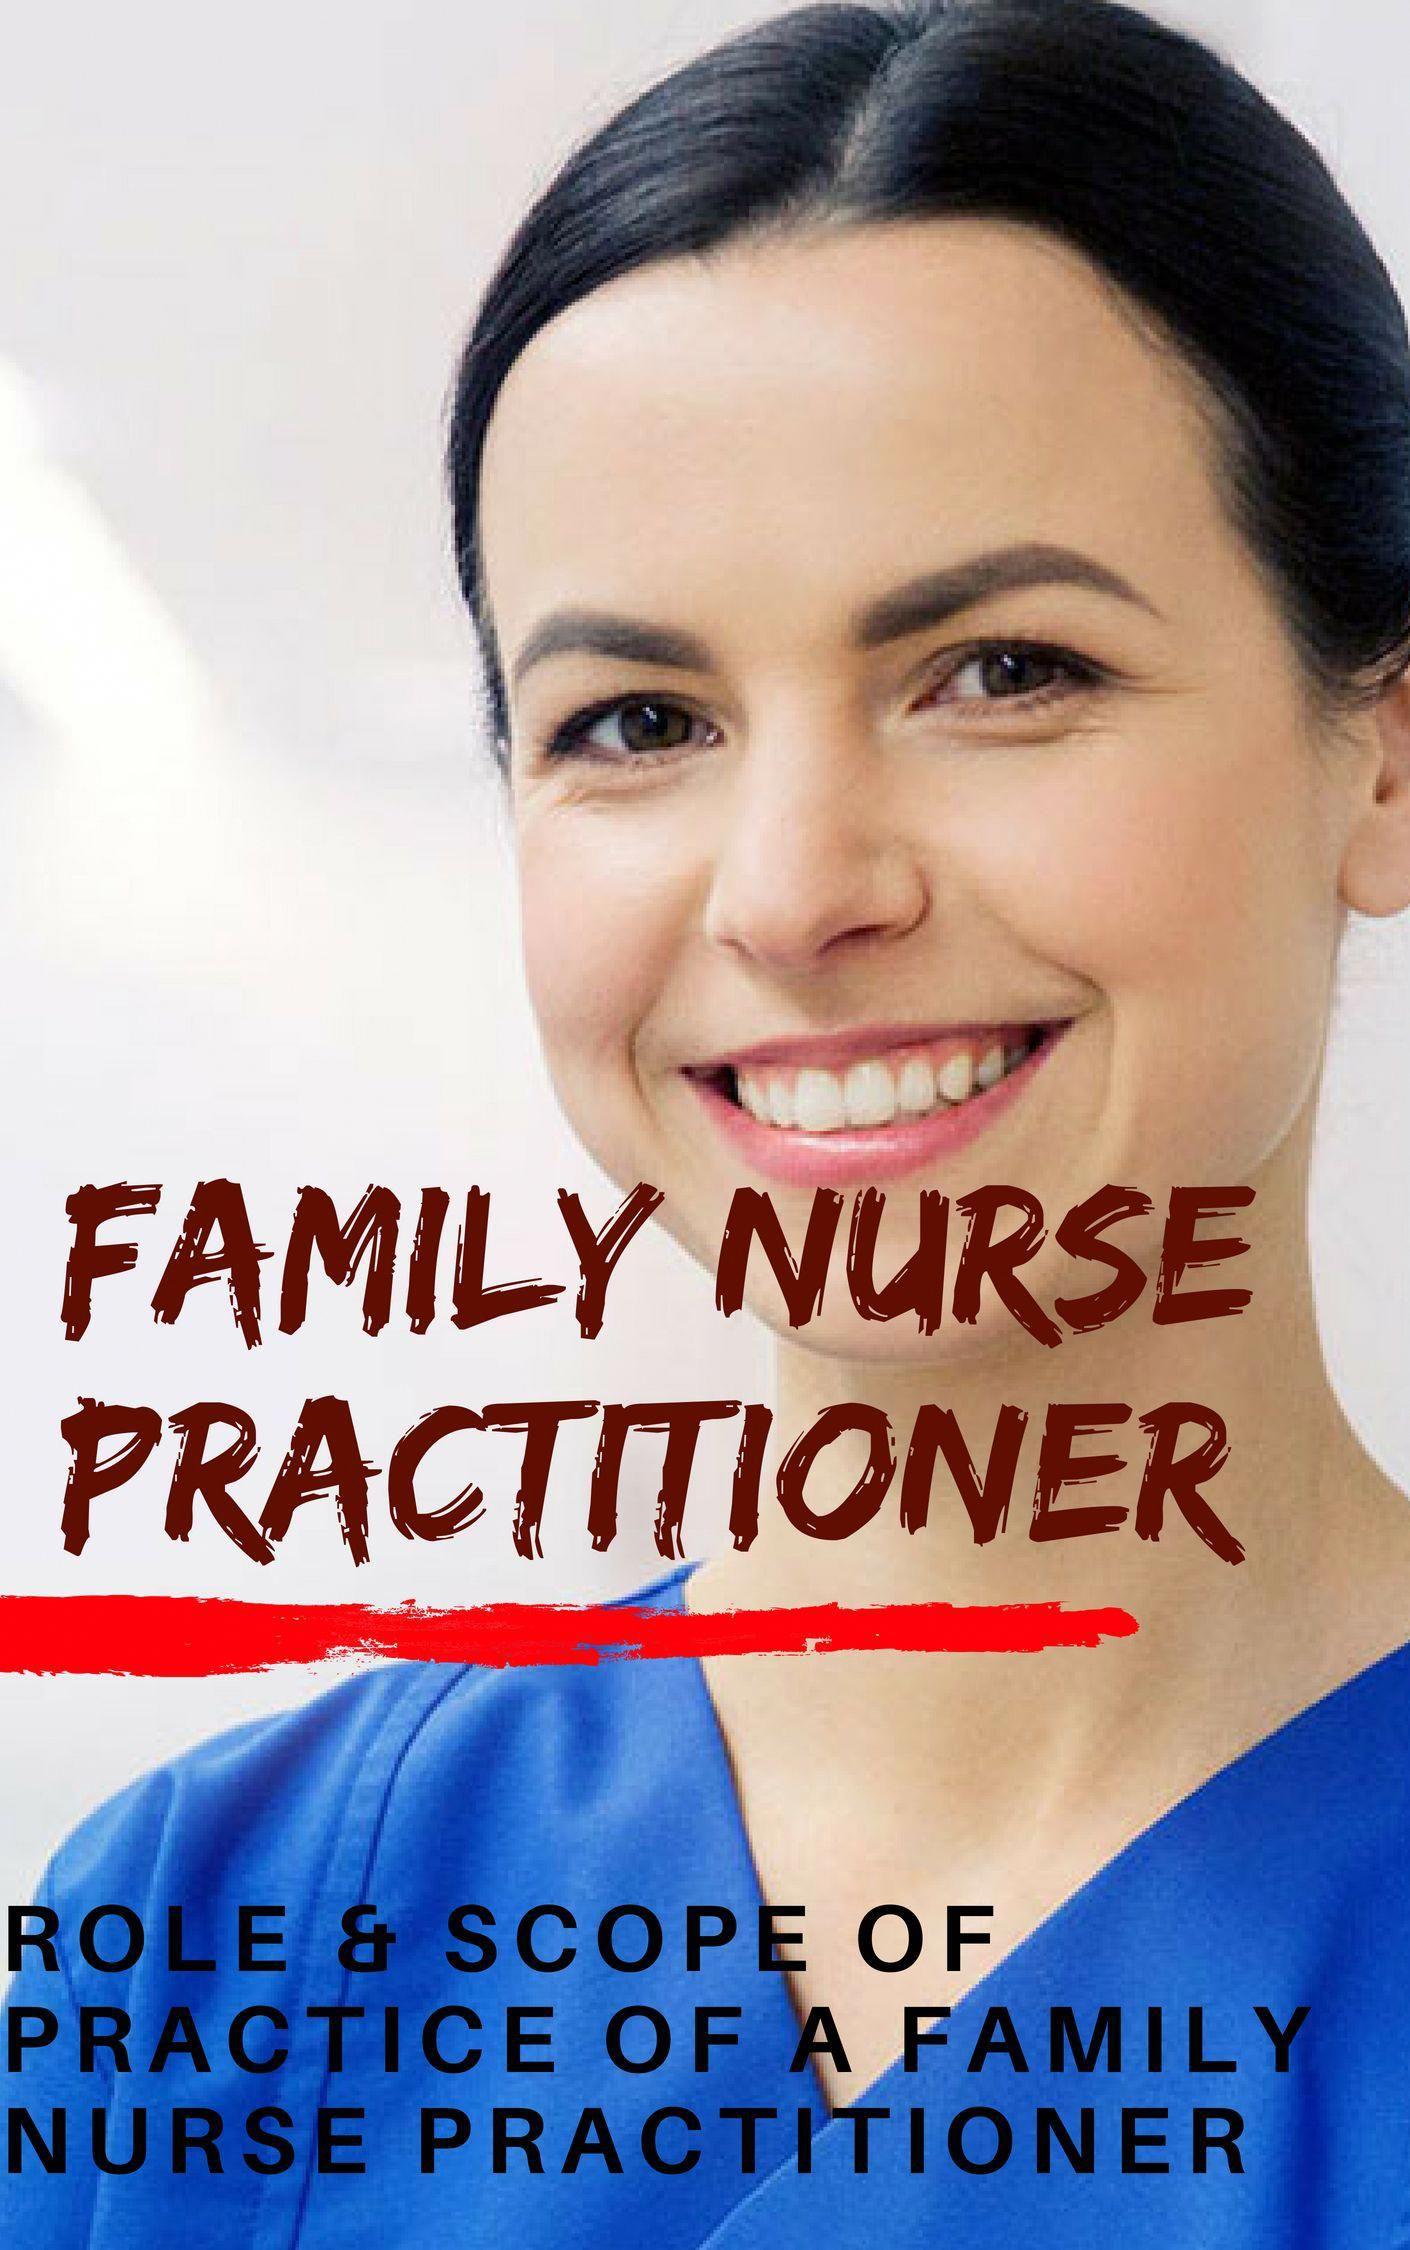 1 Year Nurse Practitioner Programs Online Lpnsalary Family Nurse Practitioner Nurse Practitioner Family Nurse Practitioner Salary